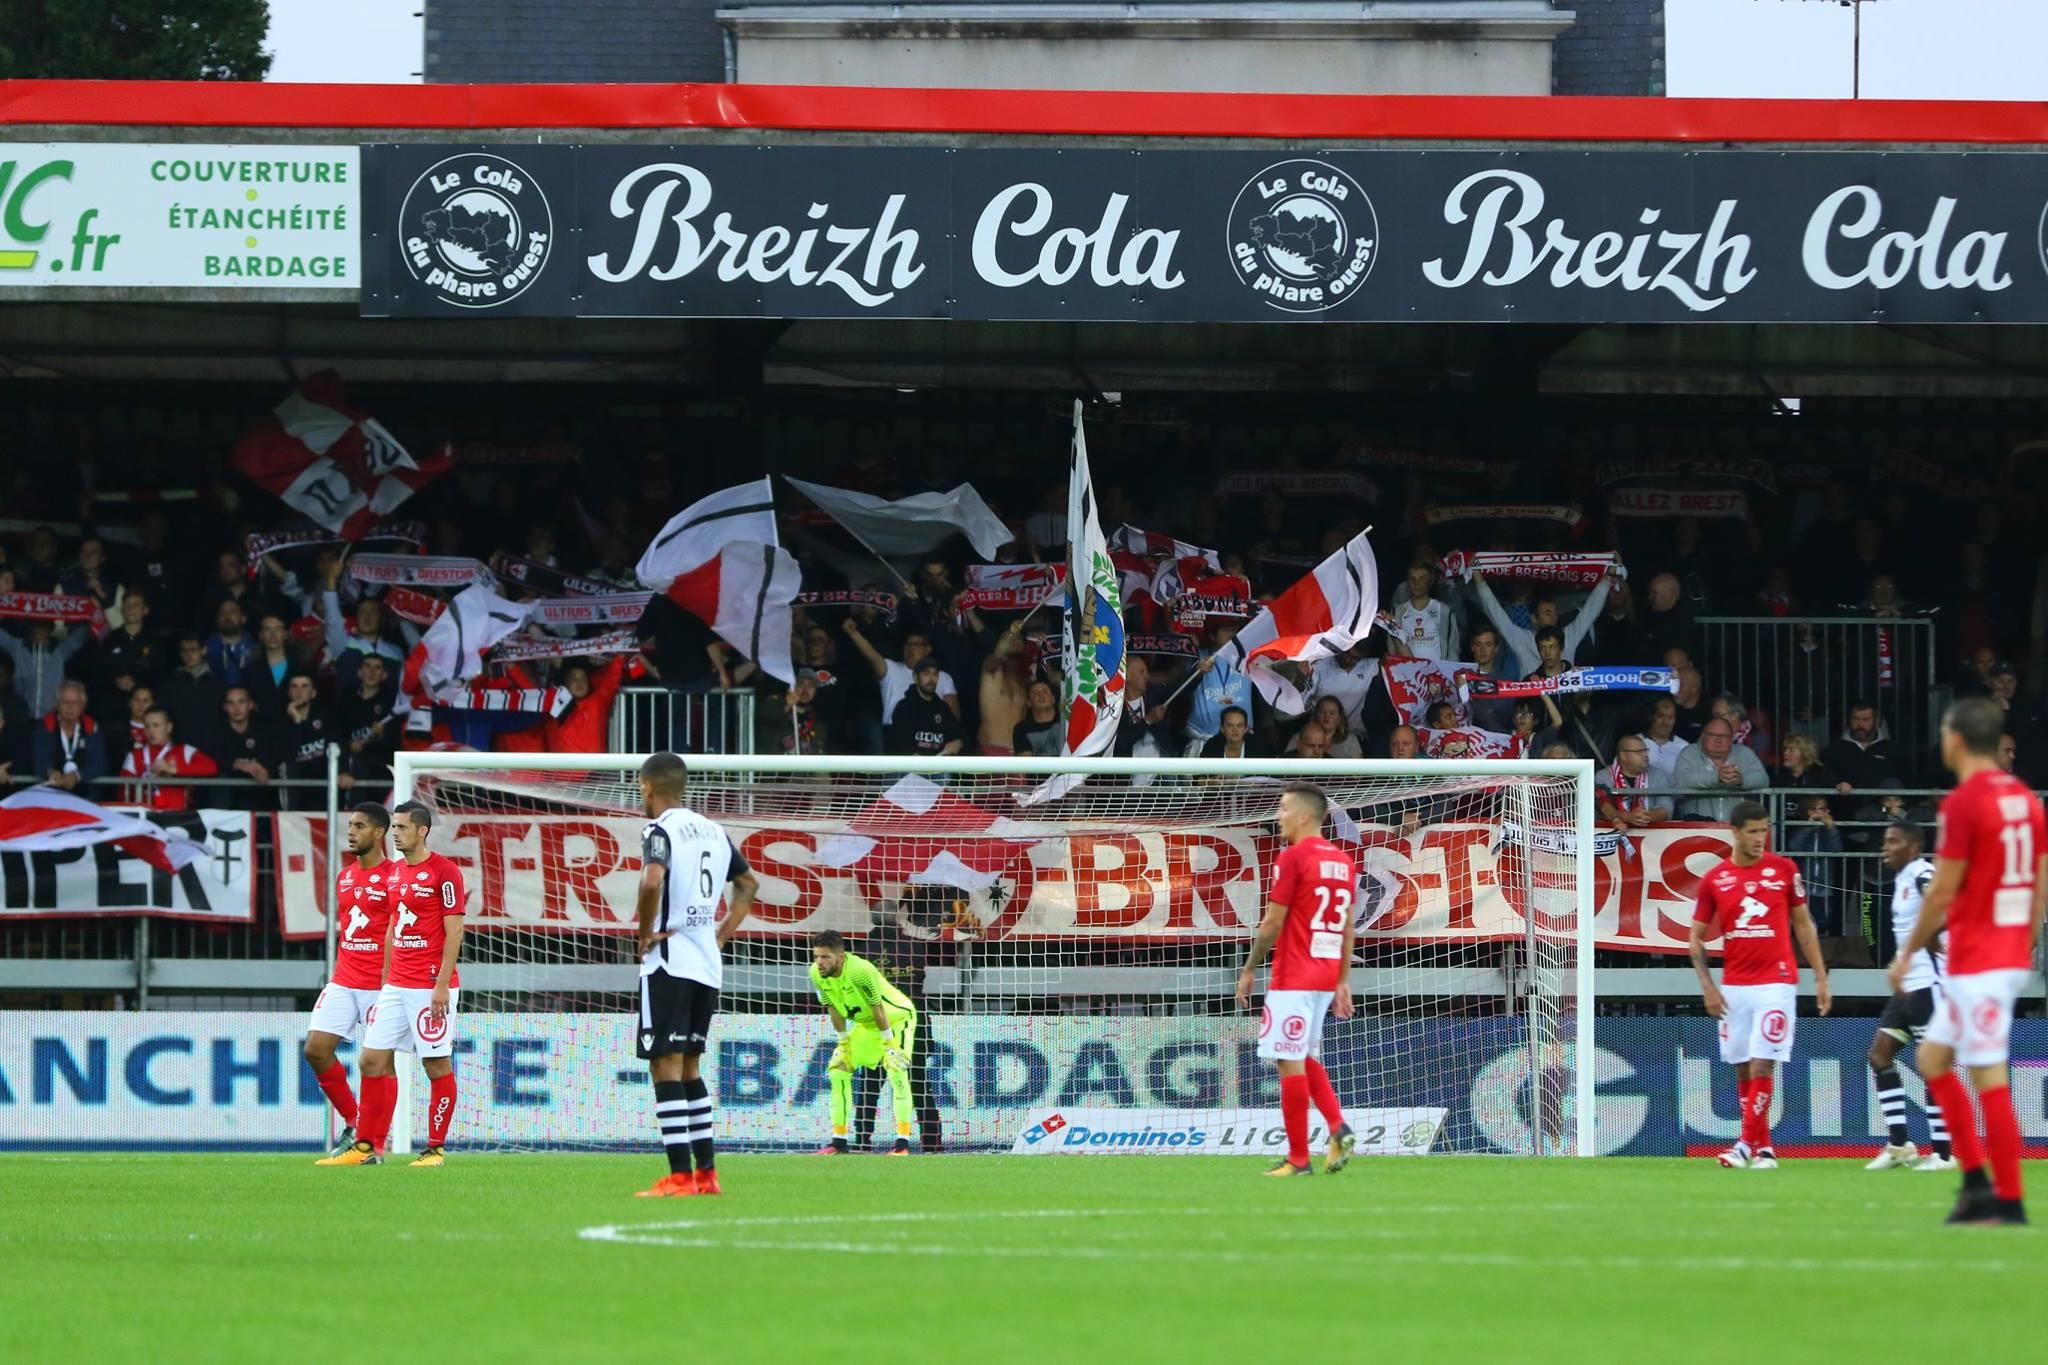 site off stade brestois